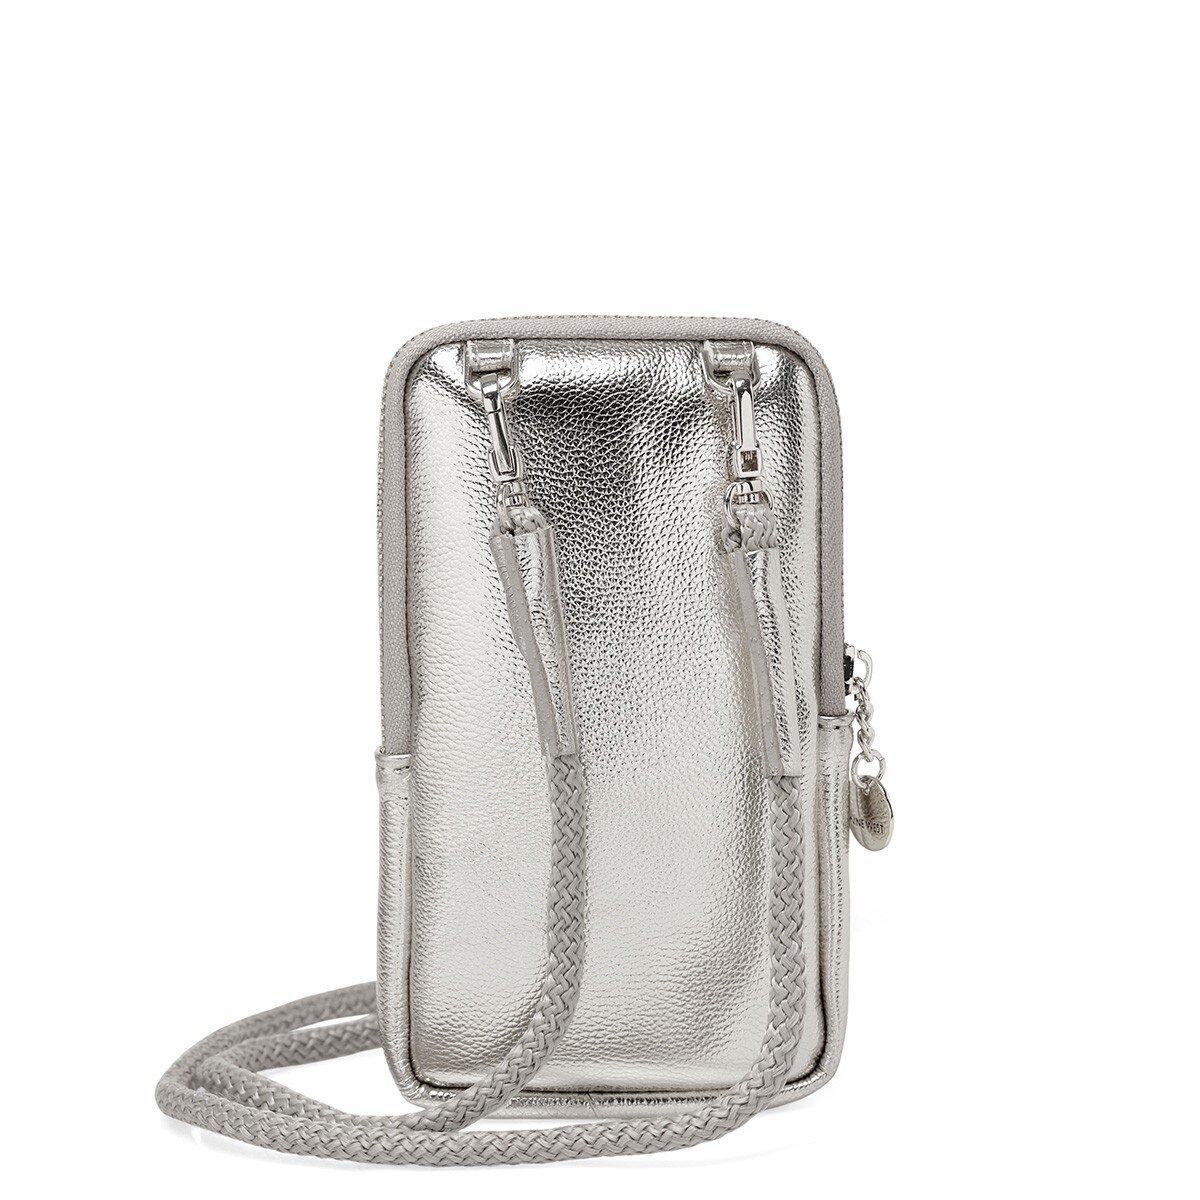 MOTTO 1FX Gümüş Kadın Çapraz Çanta